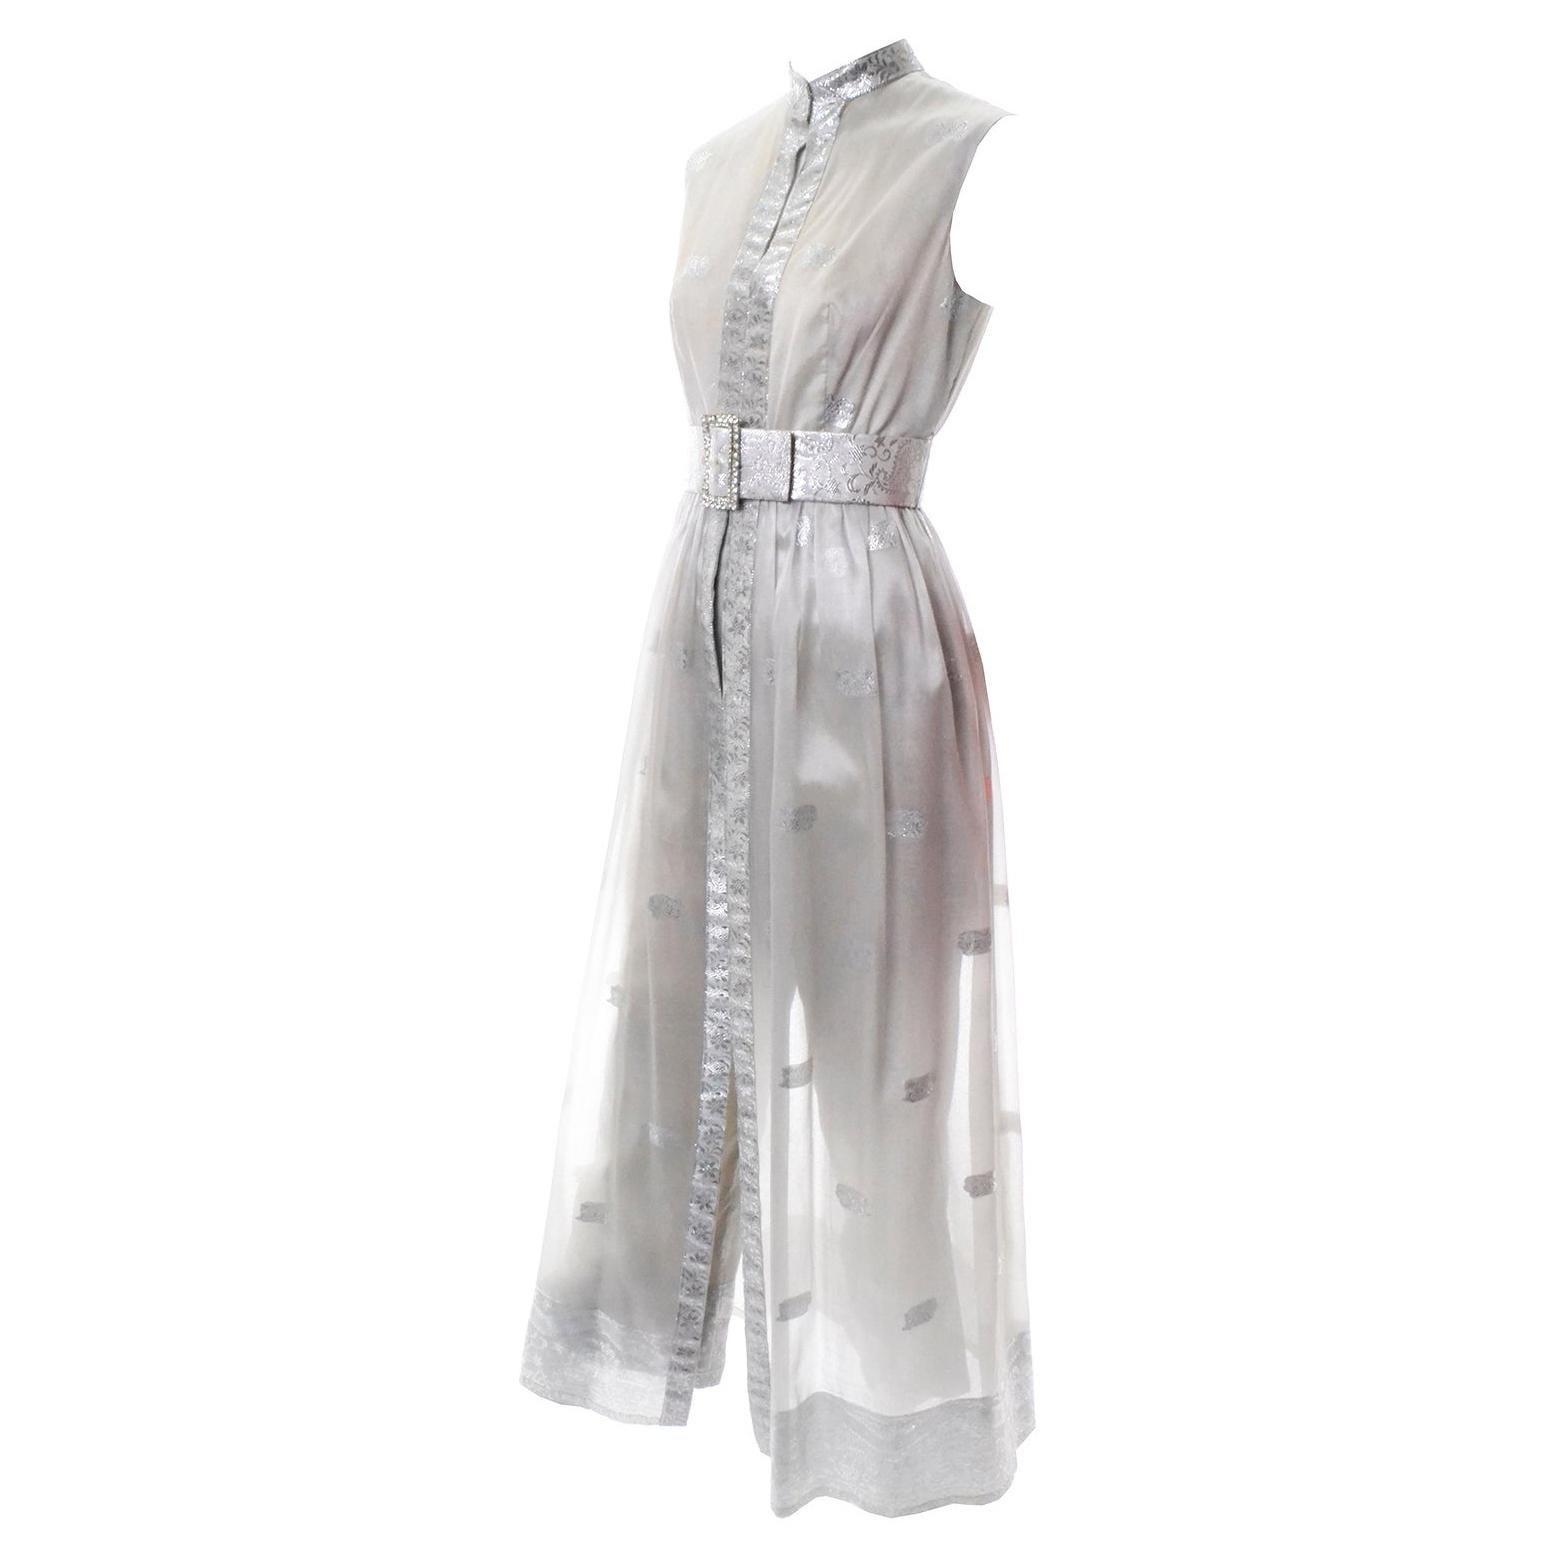 Oscar de la Renta Vintage 2pc Tunic Dress in Metallic Sheer Organza Over Pants